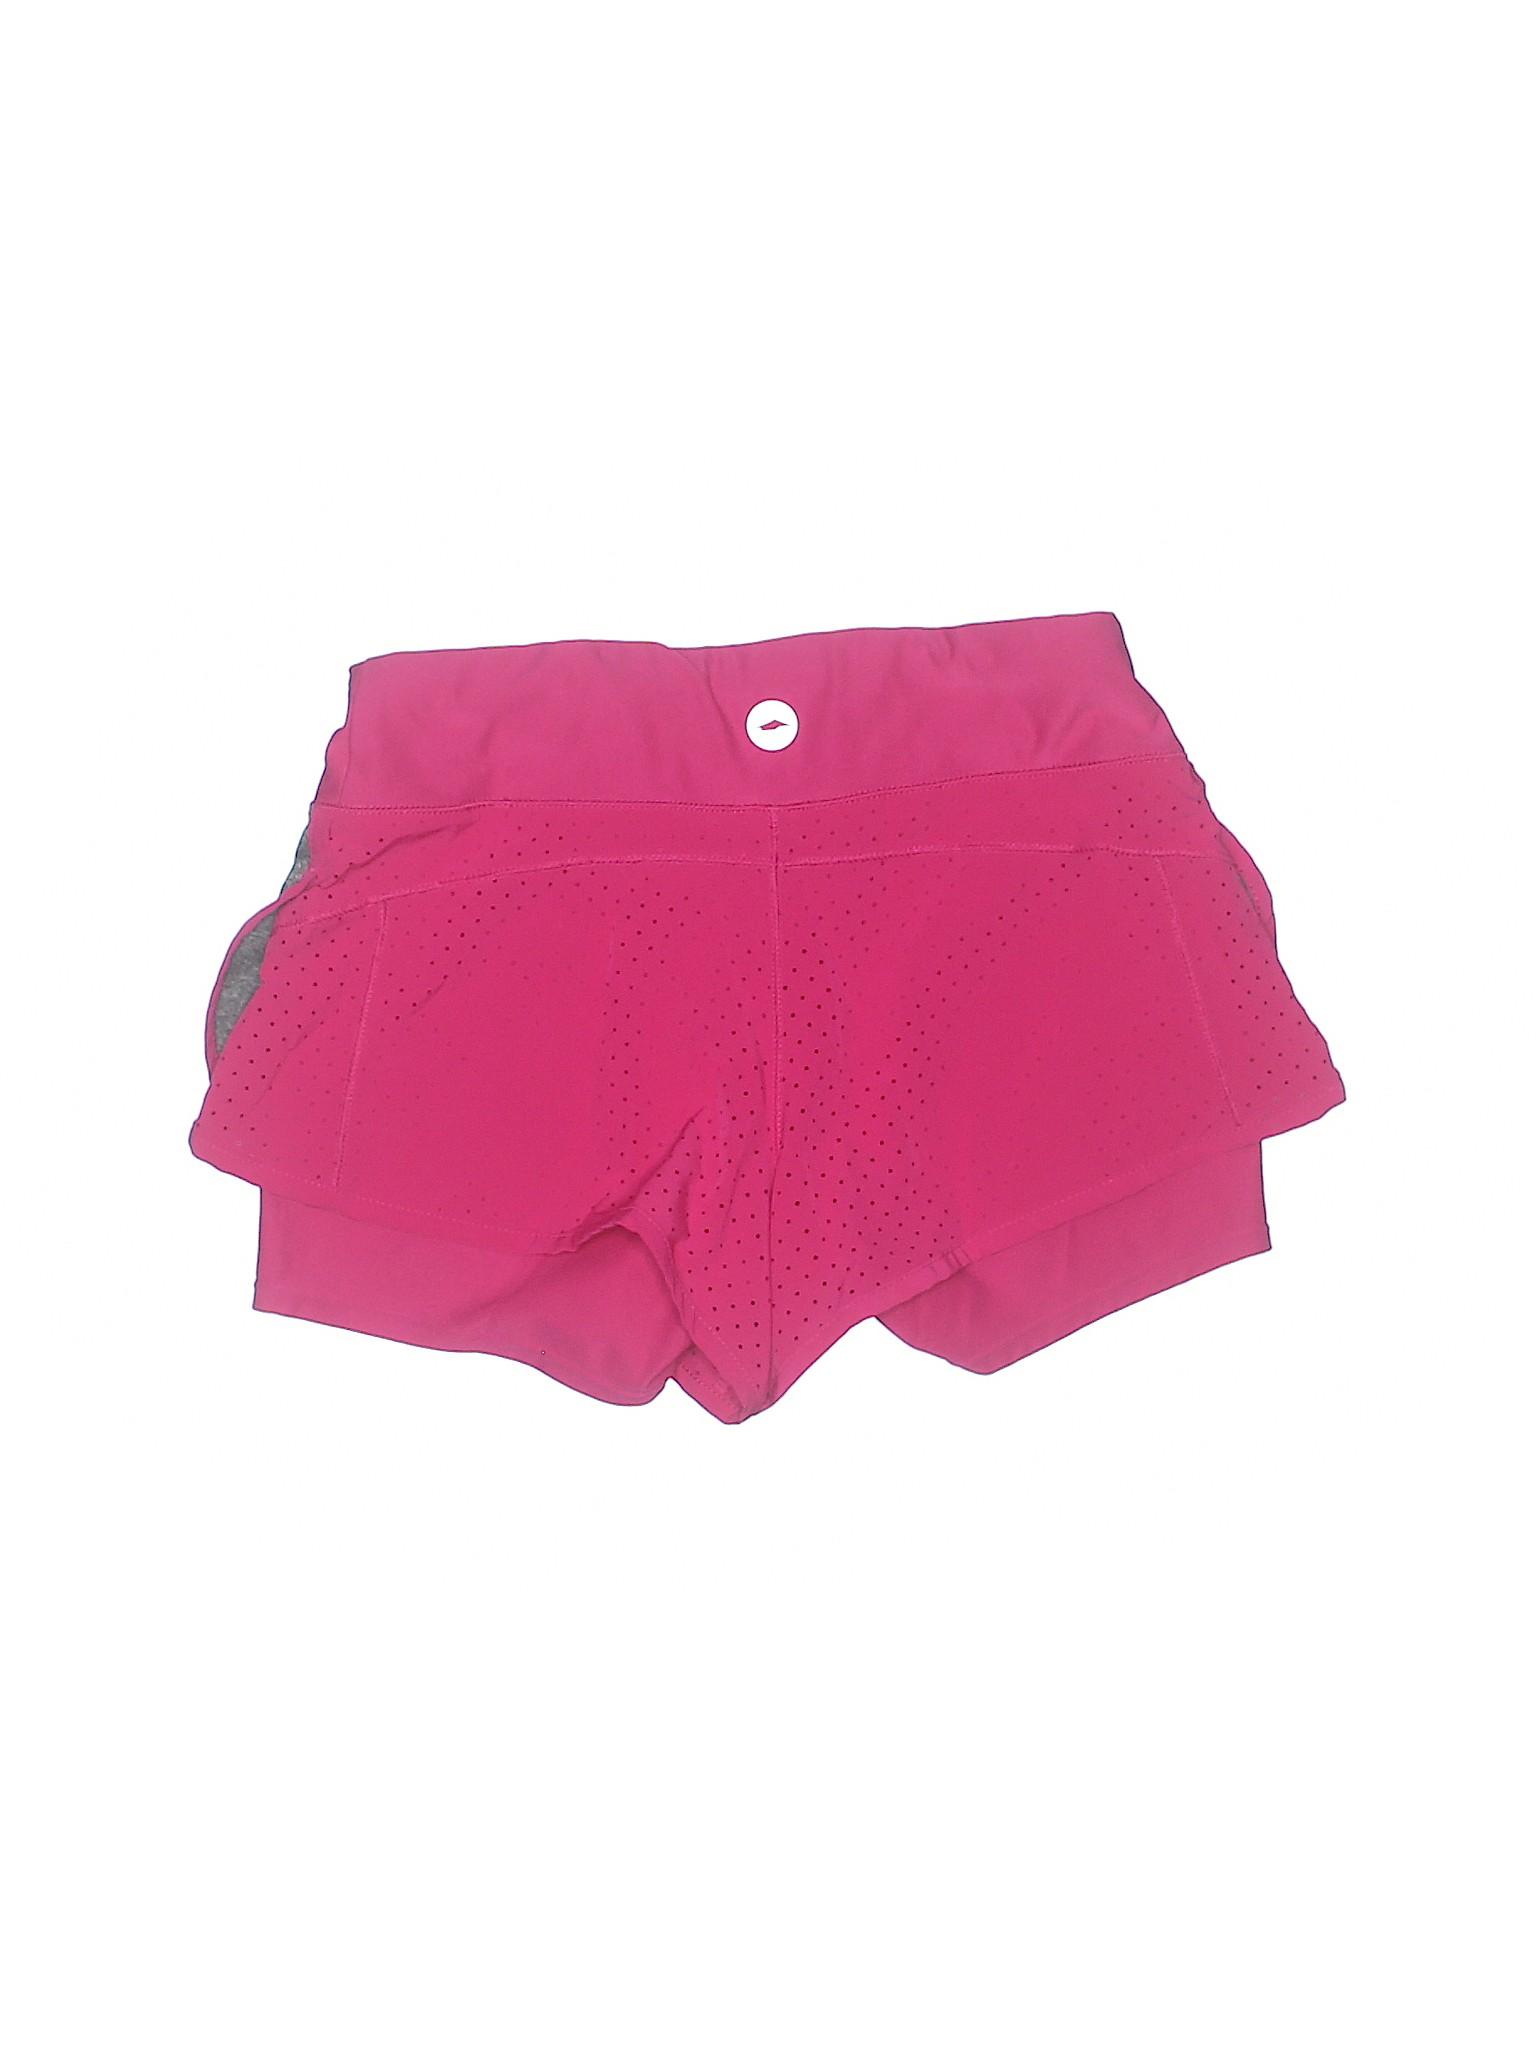 Boutique Boutique Boutique Boutique Shorts Athletic Shorts Avia Athletic Shorts Avia Avia Avia Athletic Athletic I8Yng